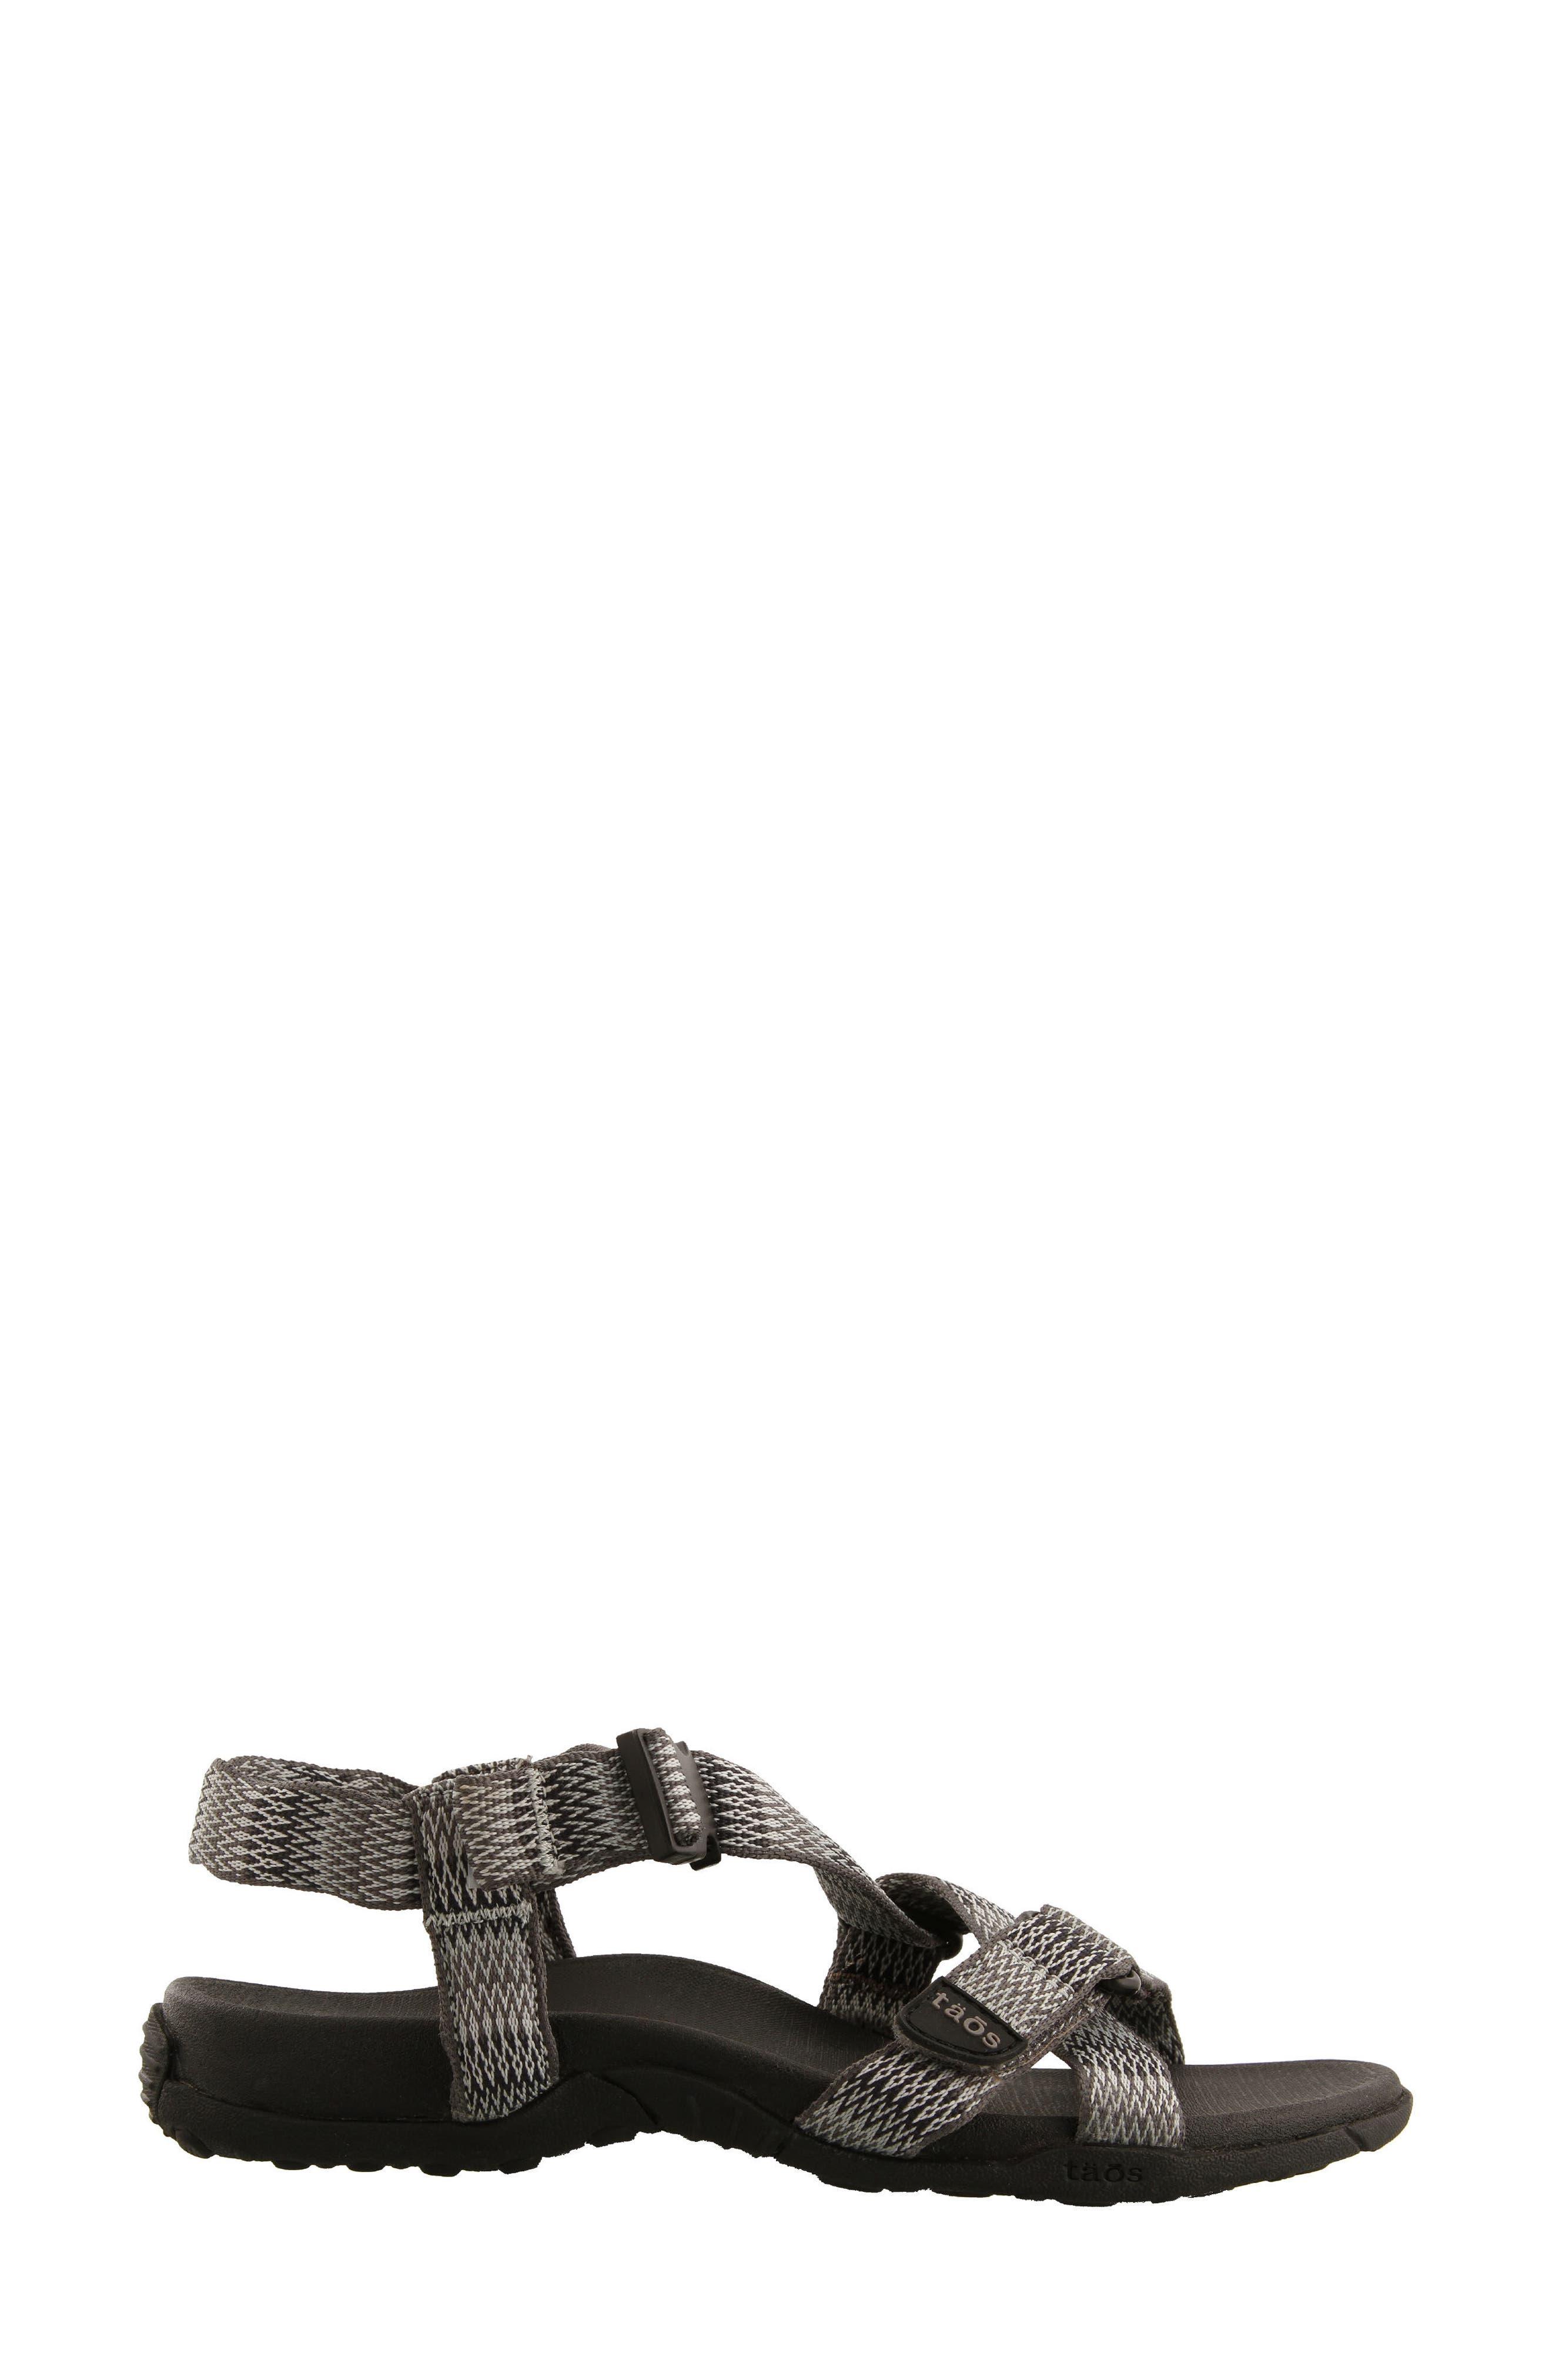 New Wave Sandal,                             Alternate thumbnail 2, color,                             BLACK FABRIC